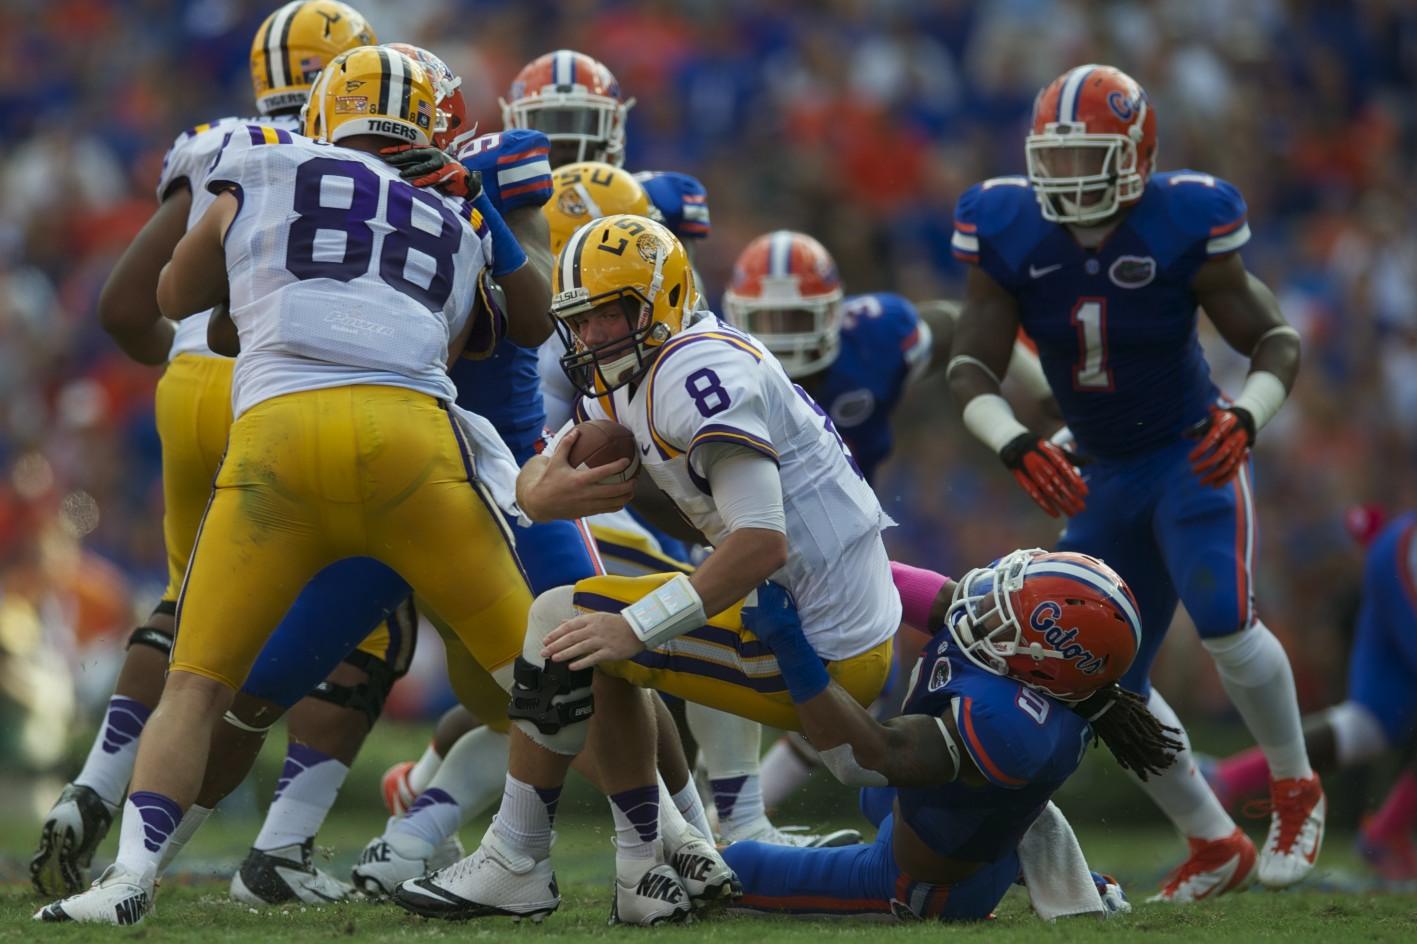 Florida's Josh Evans sacks LSu quarterback Zach Mettenberger in the second half of Saturday's game.